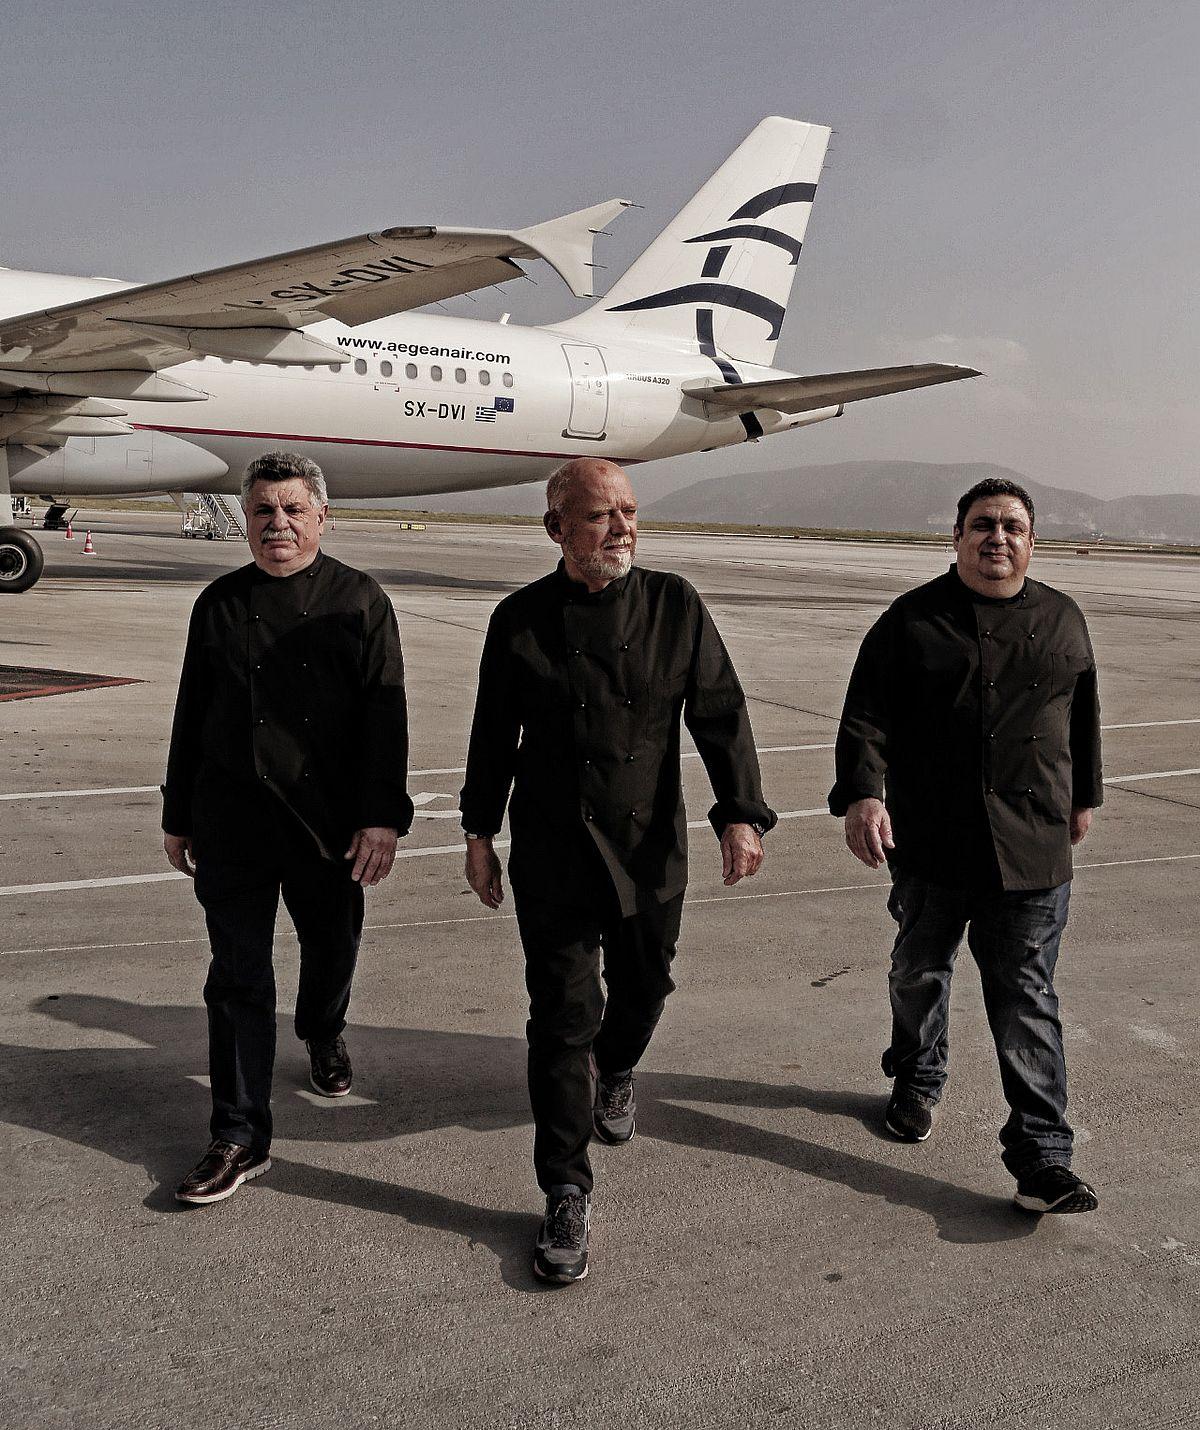 Lefteris Lazarou, Christoforos Peskias and Stelios Parliaros